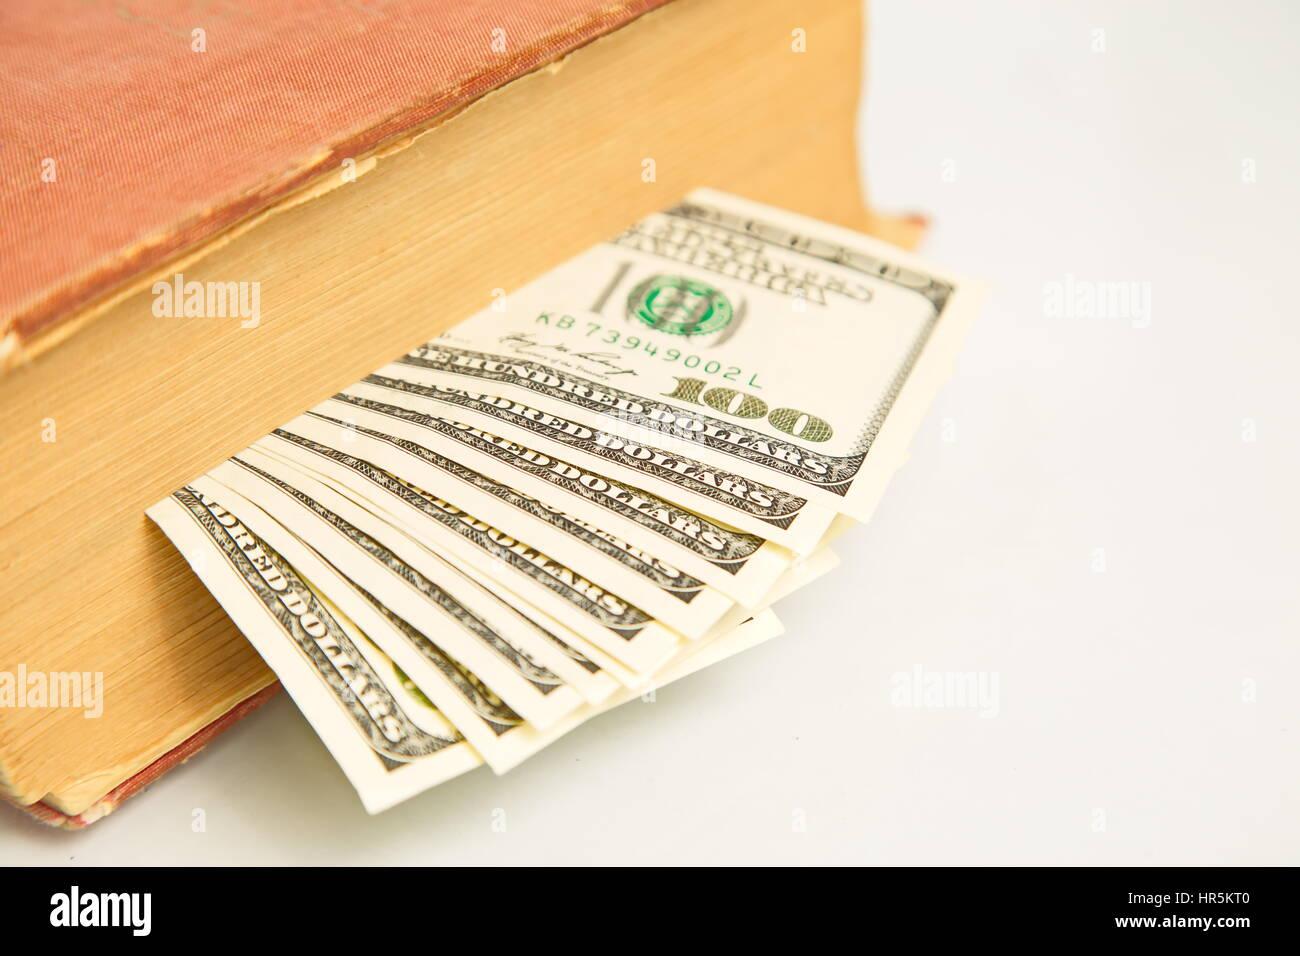 Hundred dollar bills in book - Stock Image